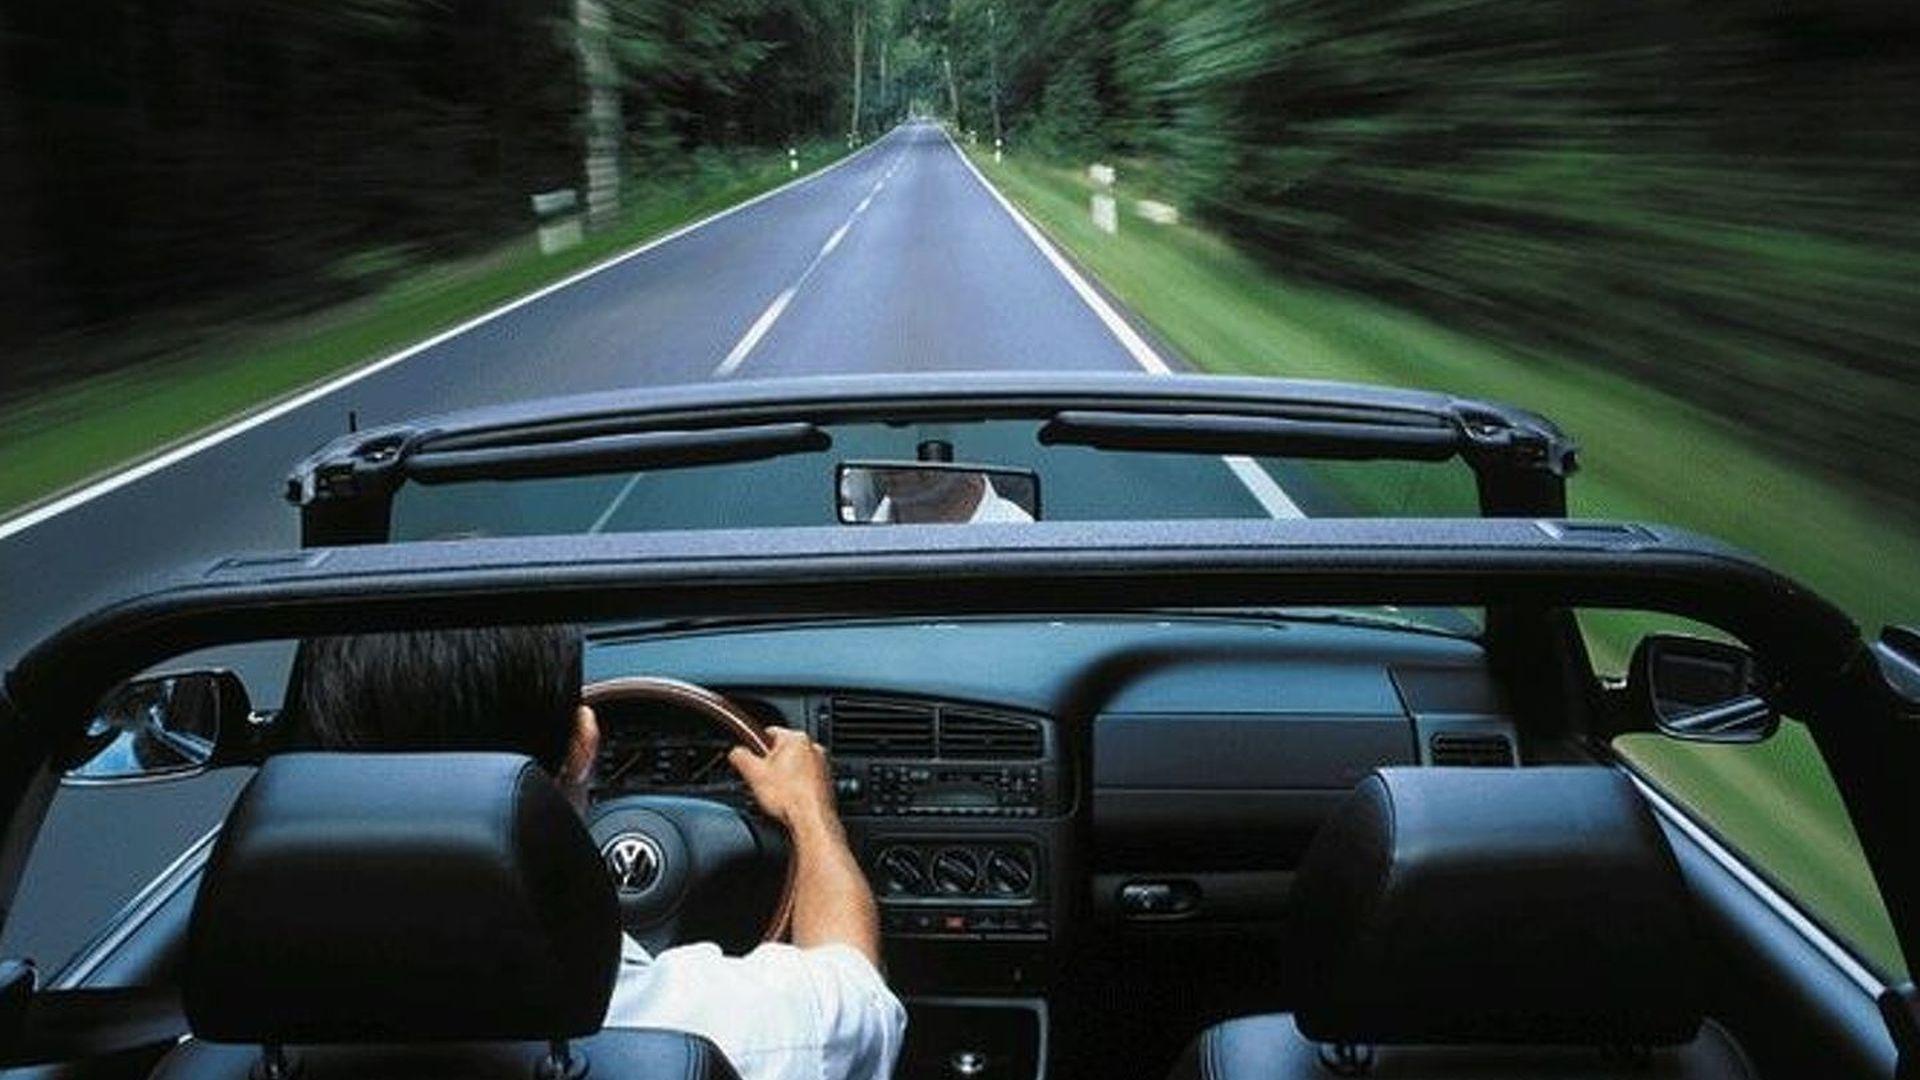 VW Golf VI Will Bring Cabrio Version Back To The Market